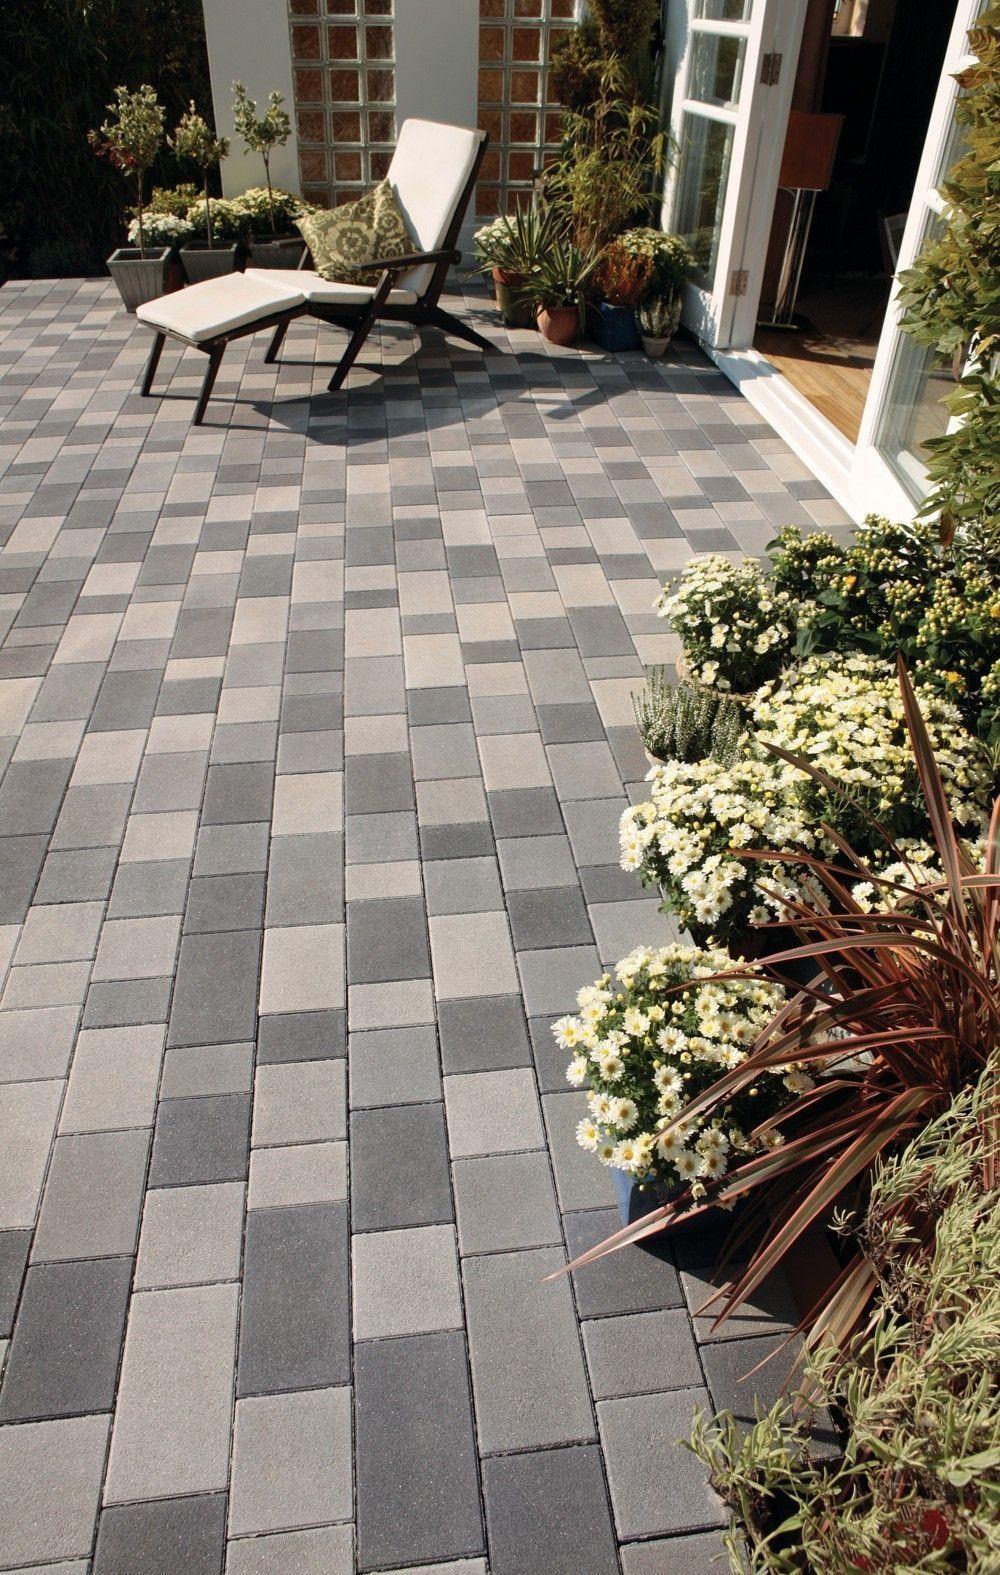 Lodge Natural Outdoor Plank Effect Porcelain 1200x300 Cheshire Sandstone Outdoor Gardens Design Outdoor Tile Patio Outdoor Porcelain Tile